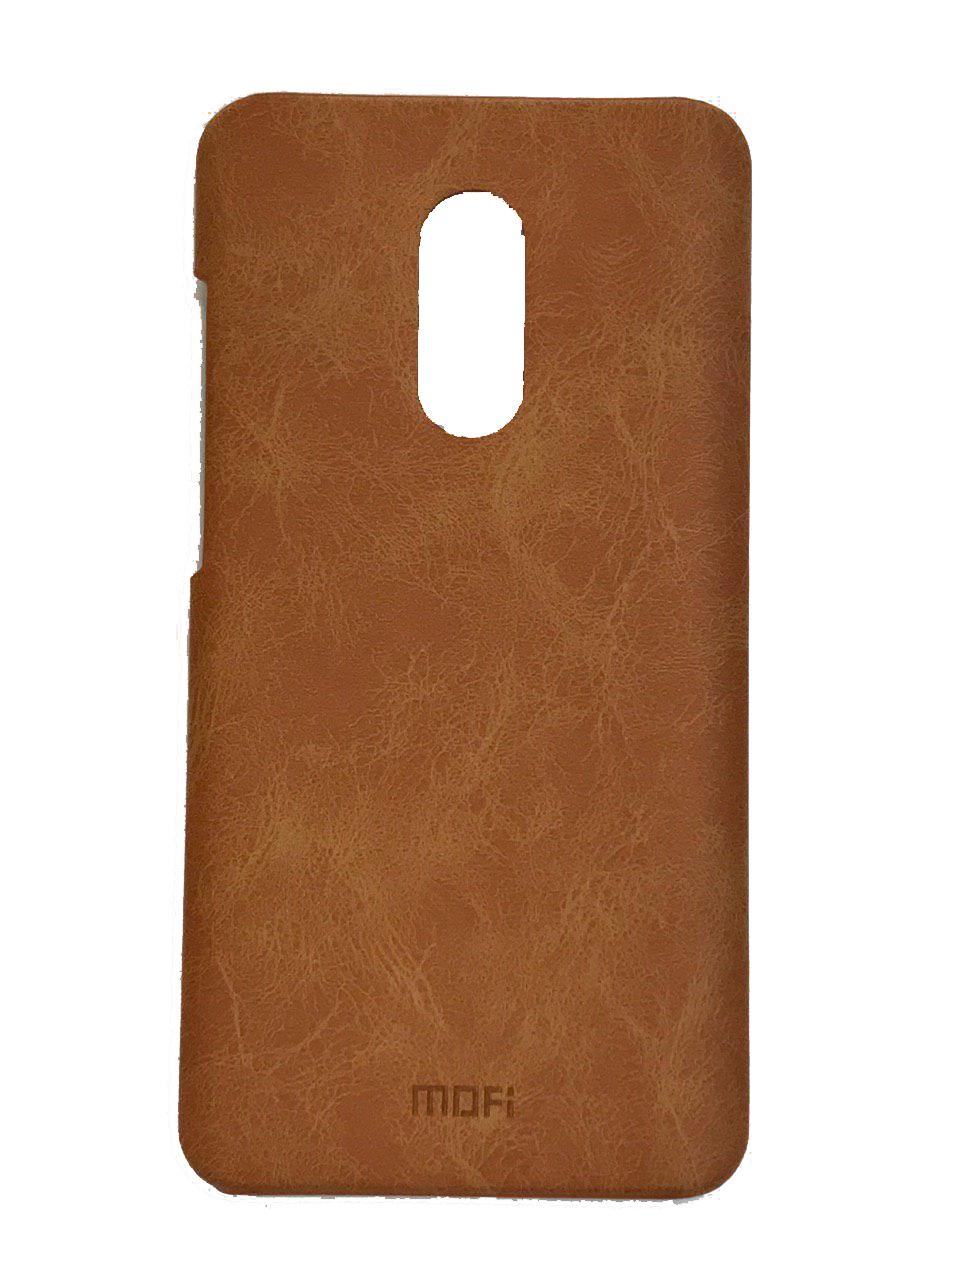 Чехол для Xiaomi Redmi 4A Накладка Xiaomi Redmi 4A Brown leather case colorful flip cover for xiaomi redmi 4a white